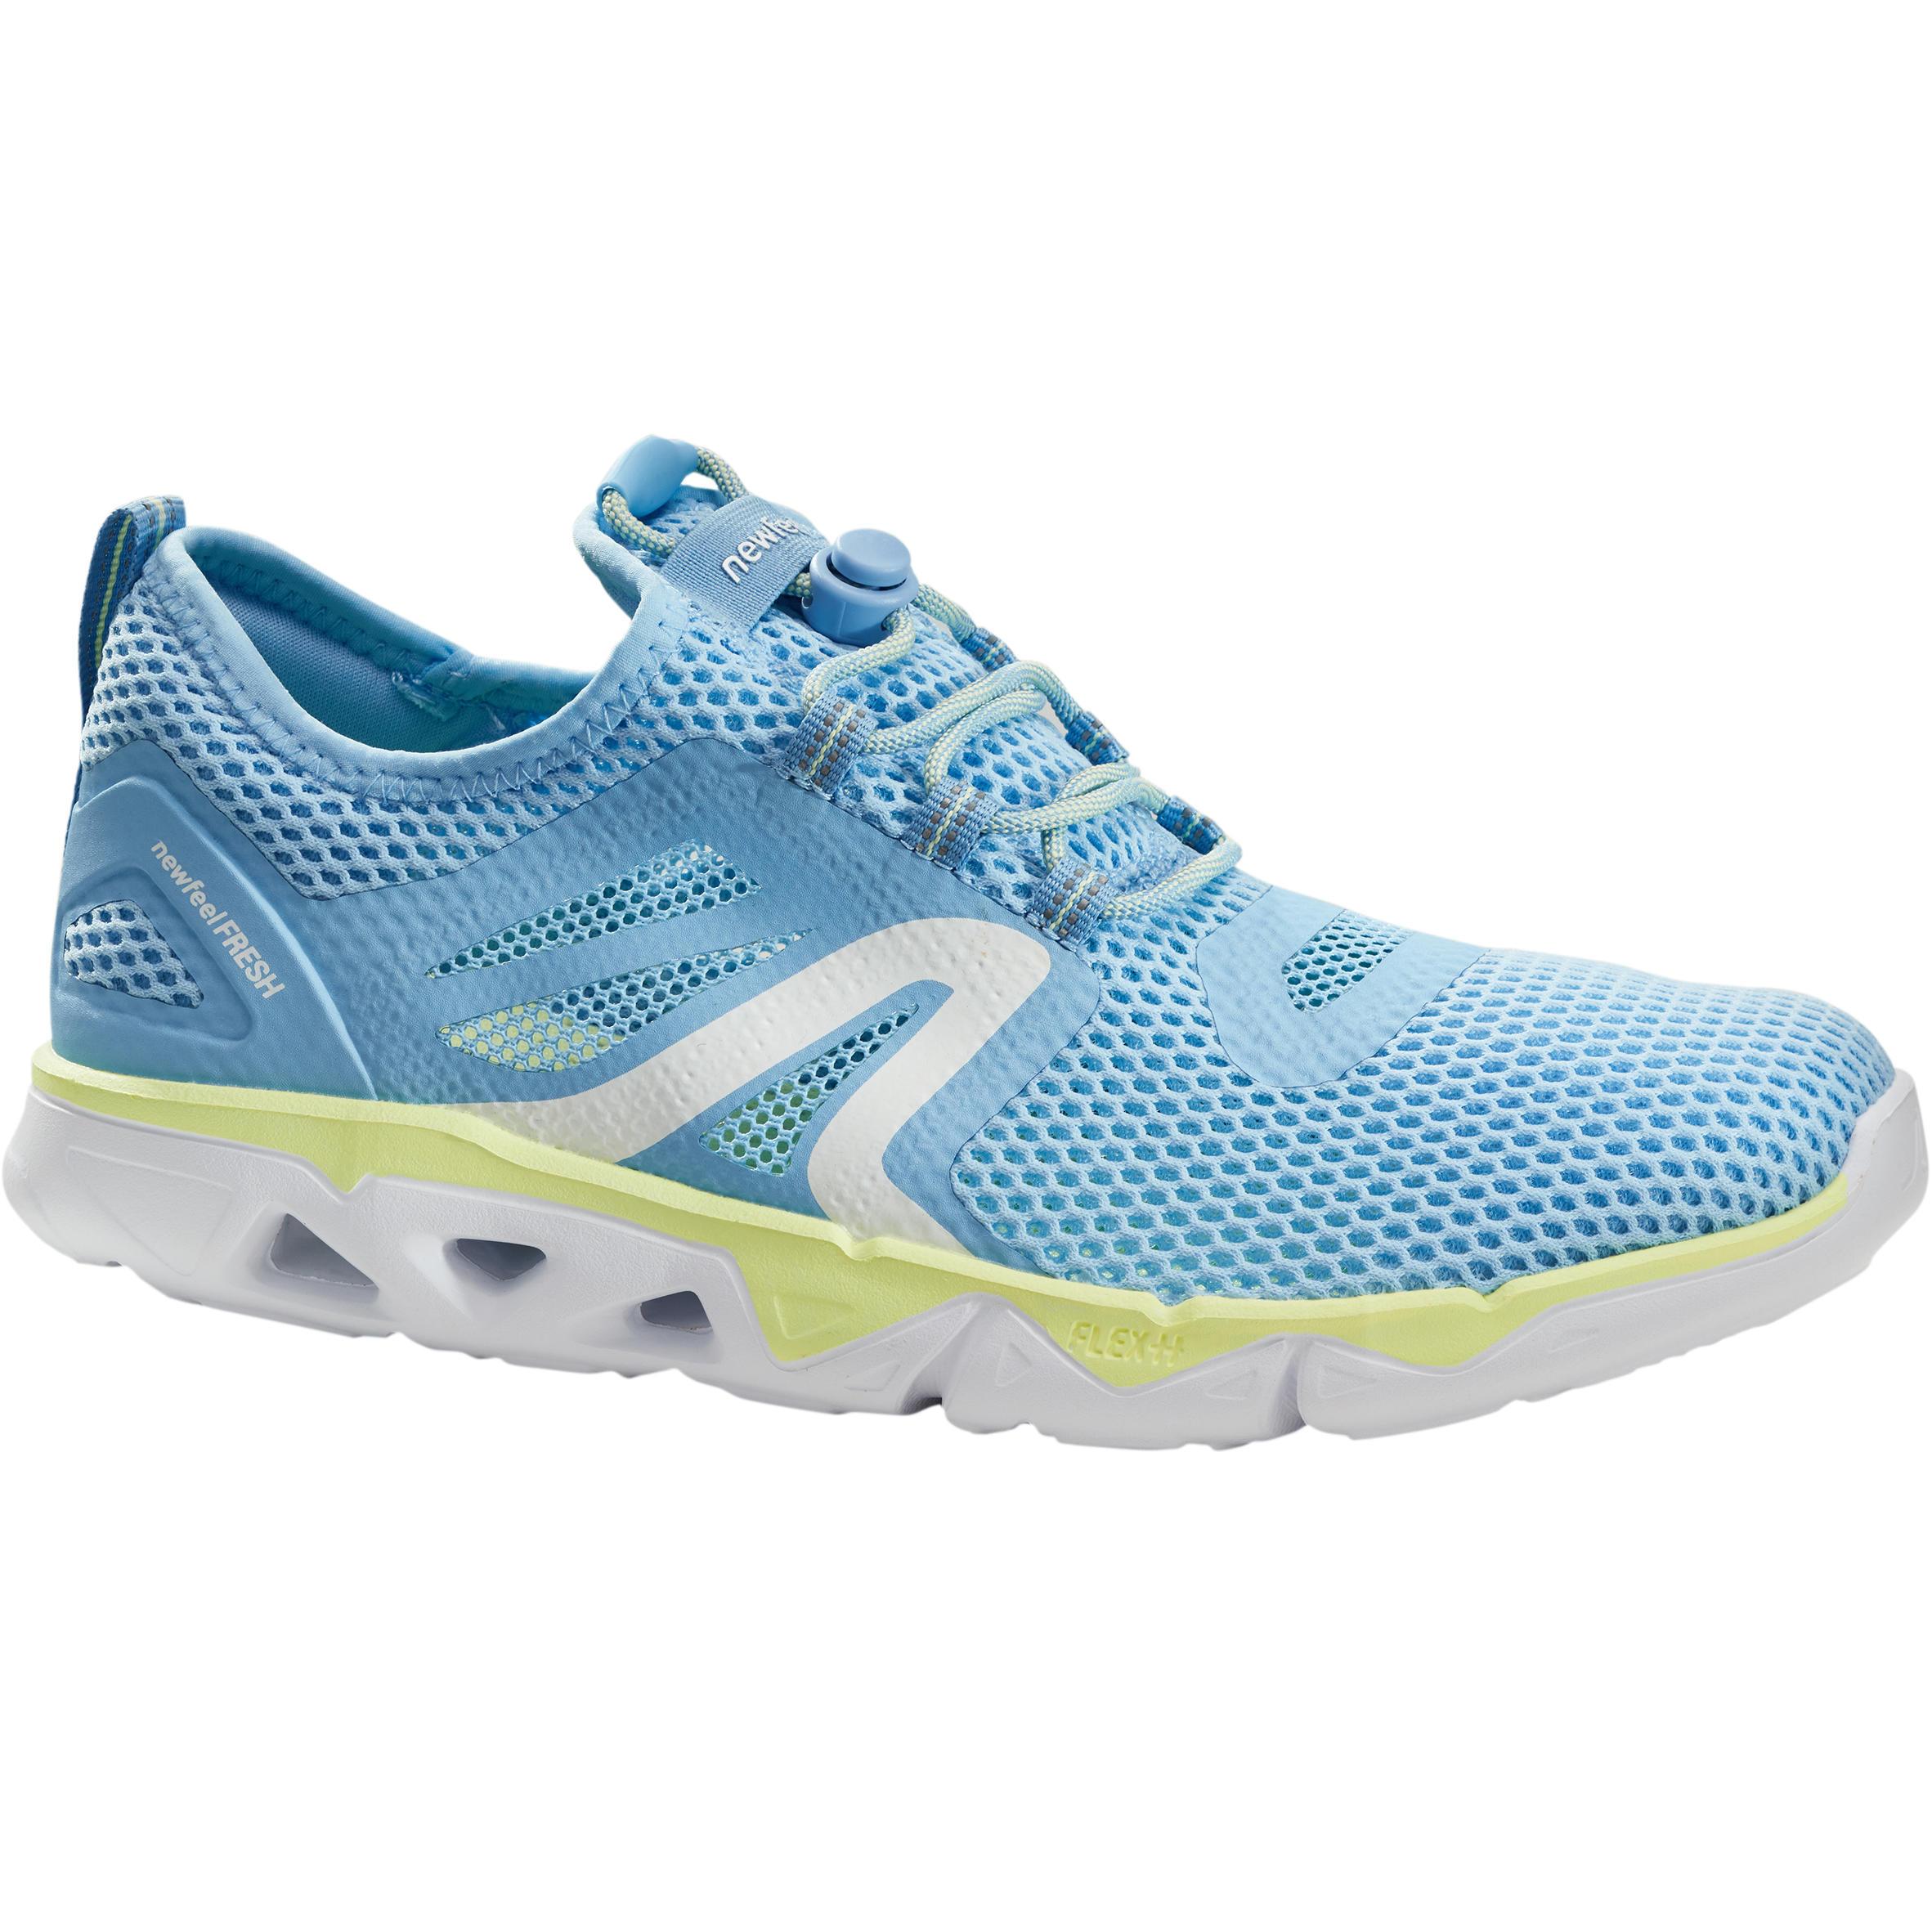 Newfeel Chaussures marche sportive femme PW 500 Fresh bleu / jaune - Newfeel